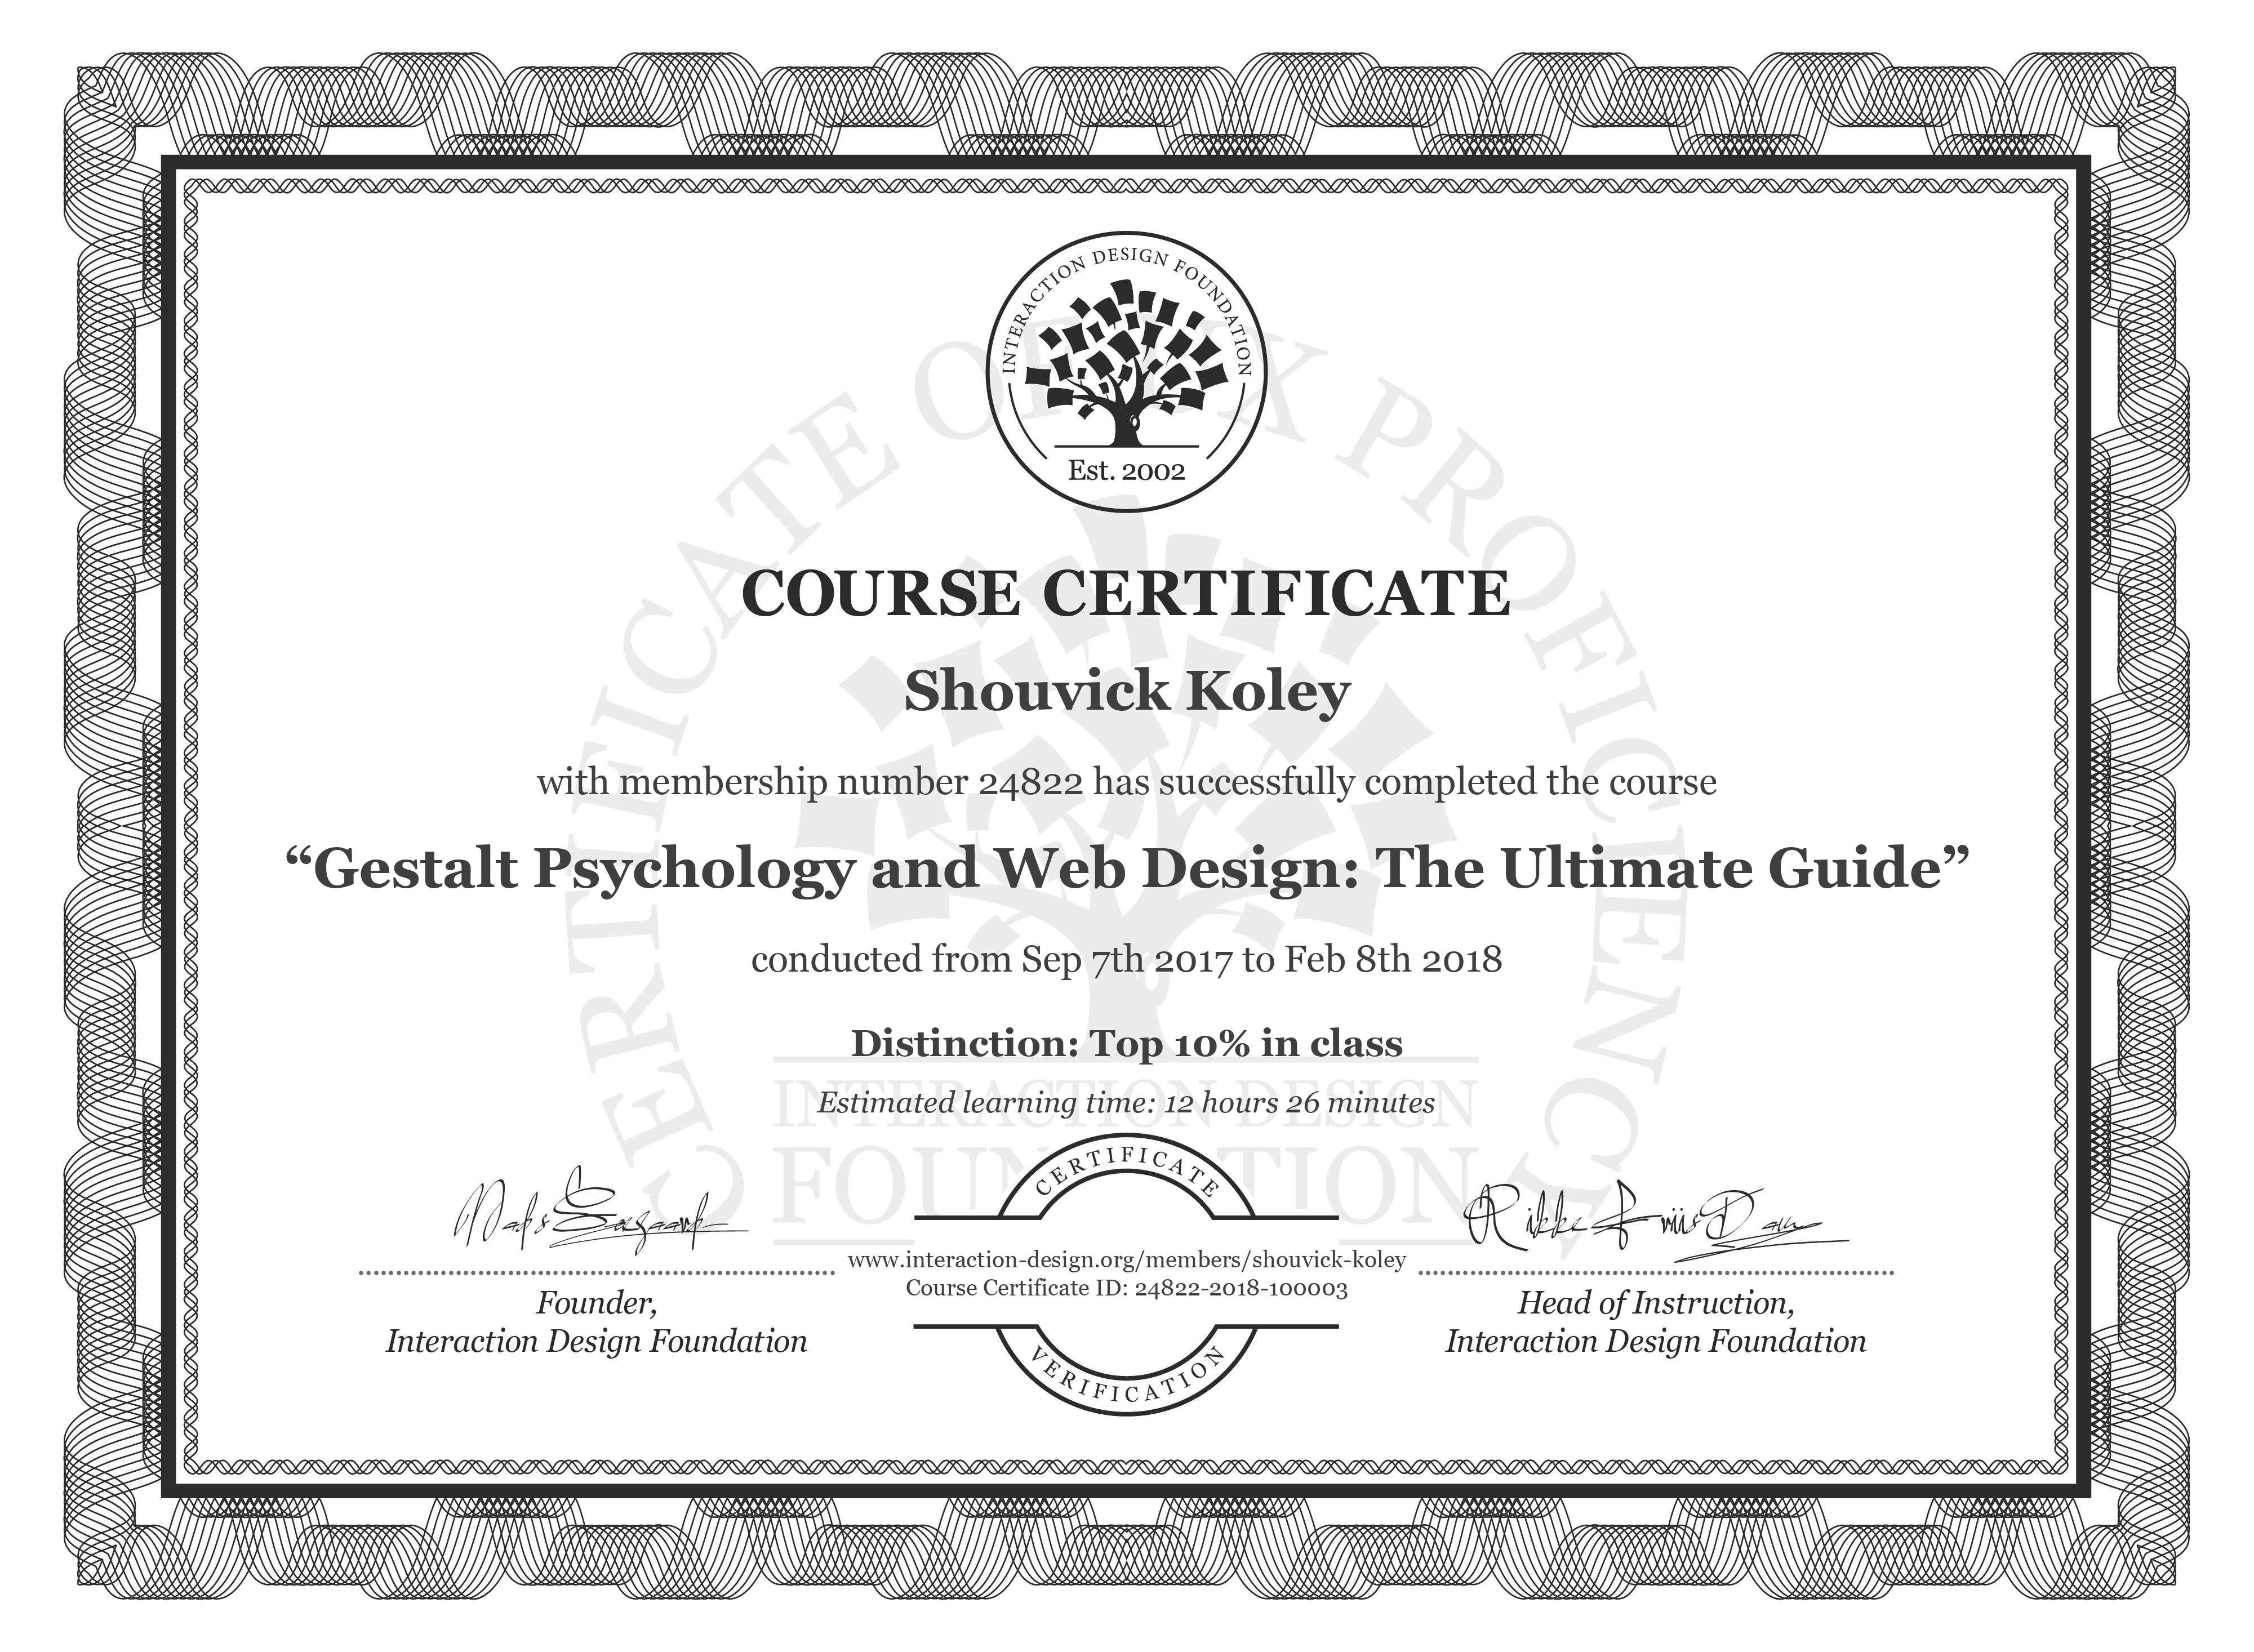 Shouvick Koley: Course Certificate - Gestalt Psychology and Web Design: The Ultimate Guide